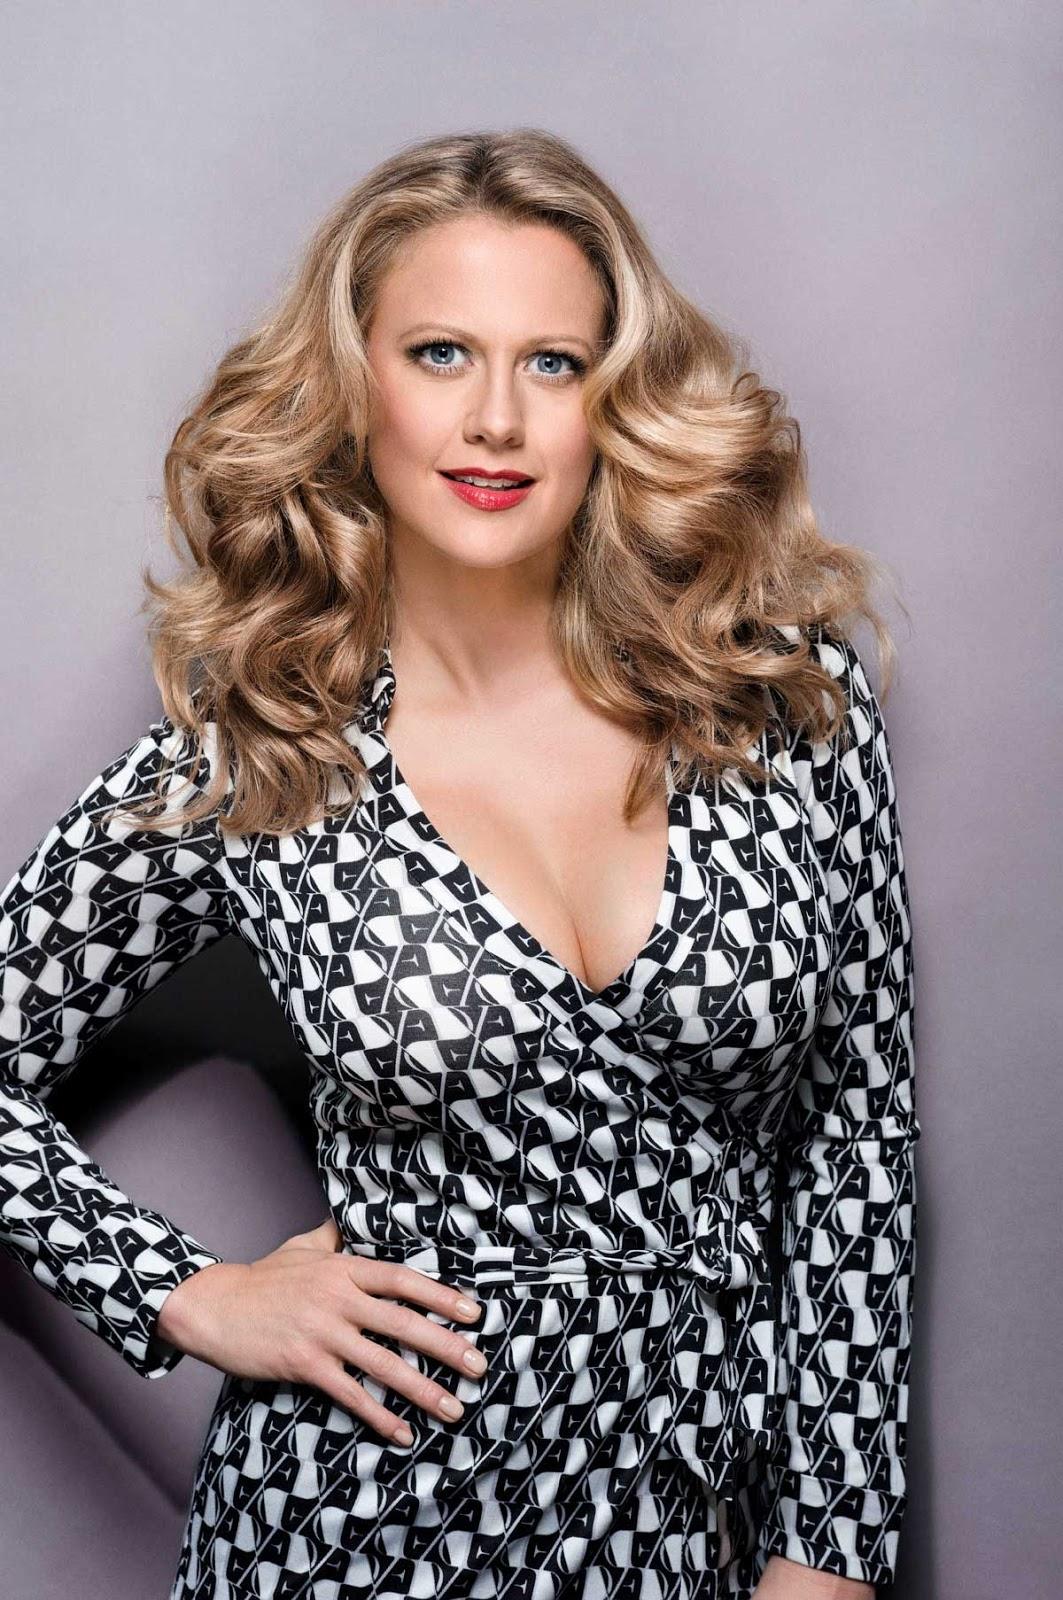 Barbara Schöneberger | Barbara Schöneberger | Pinterest | Actresses, Singer and Hair